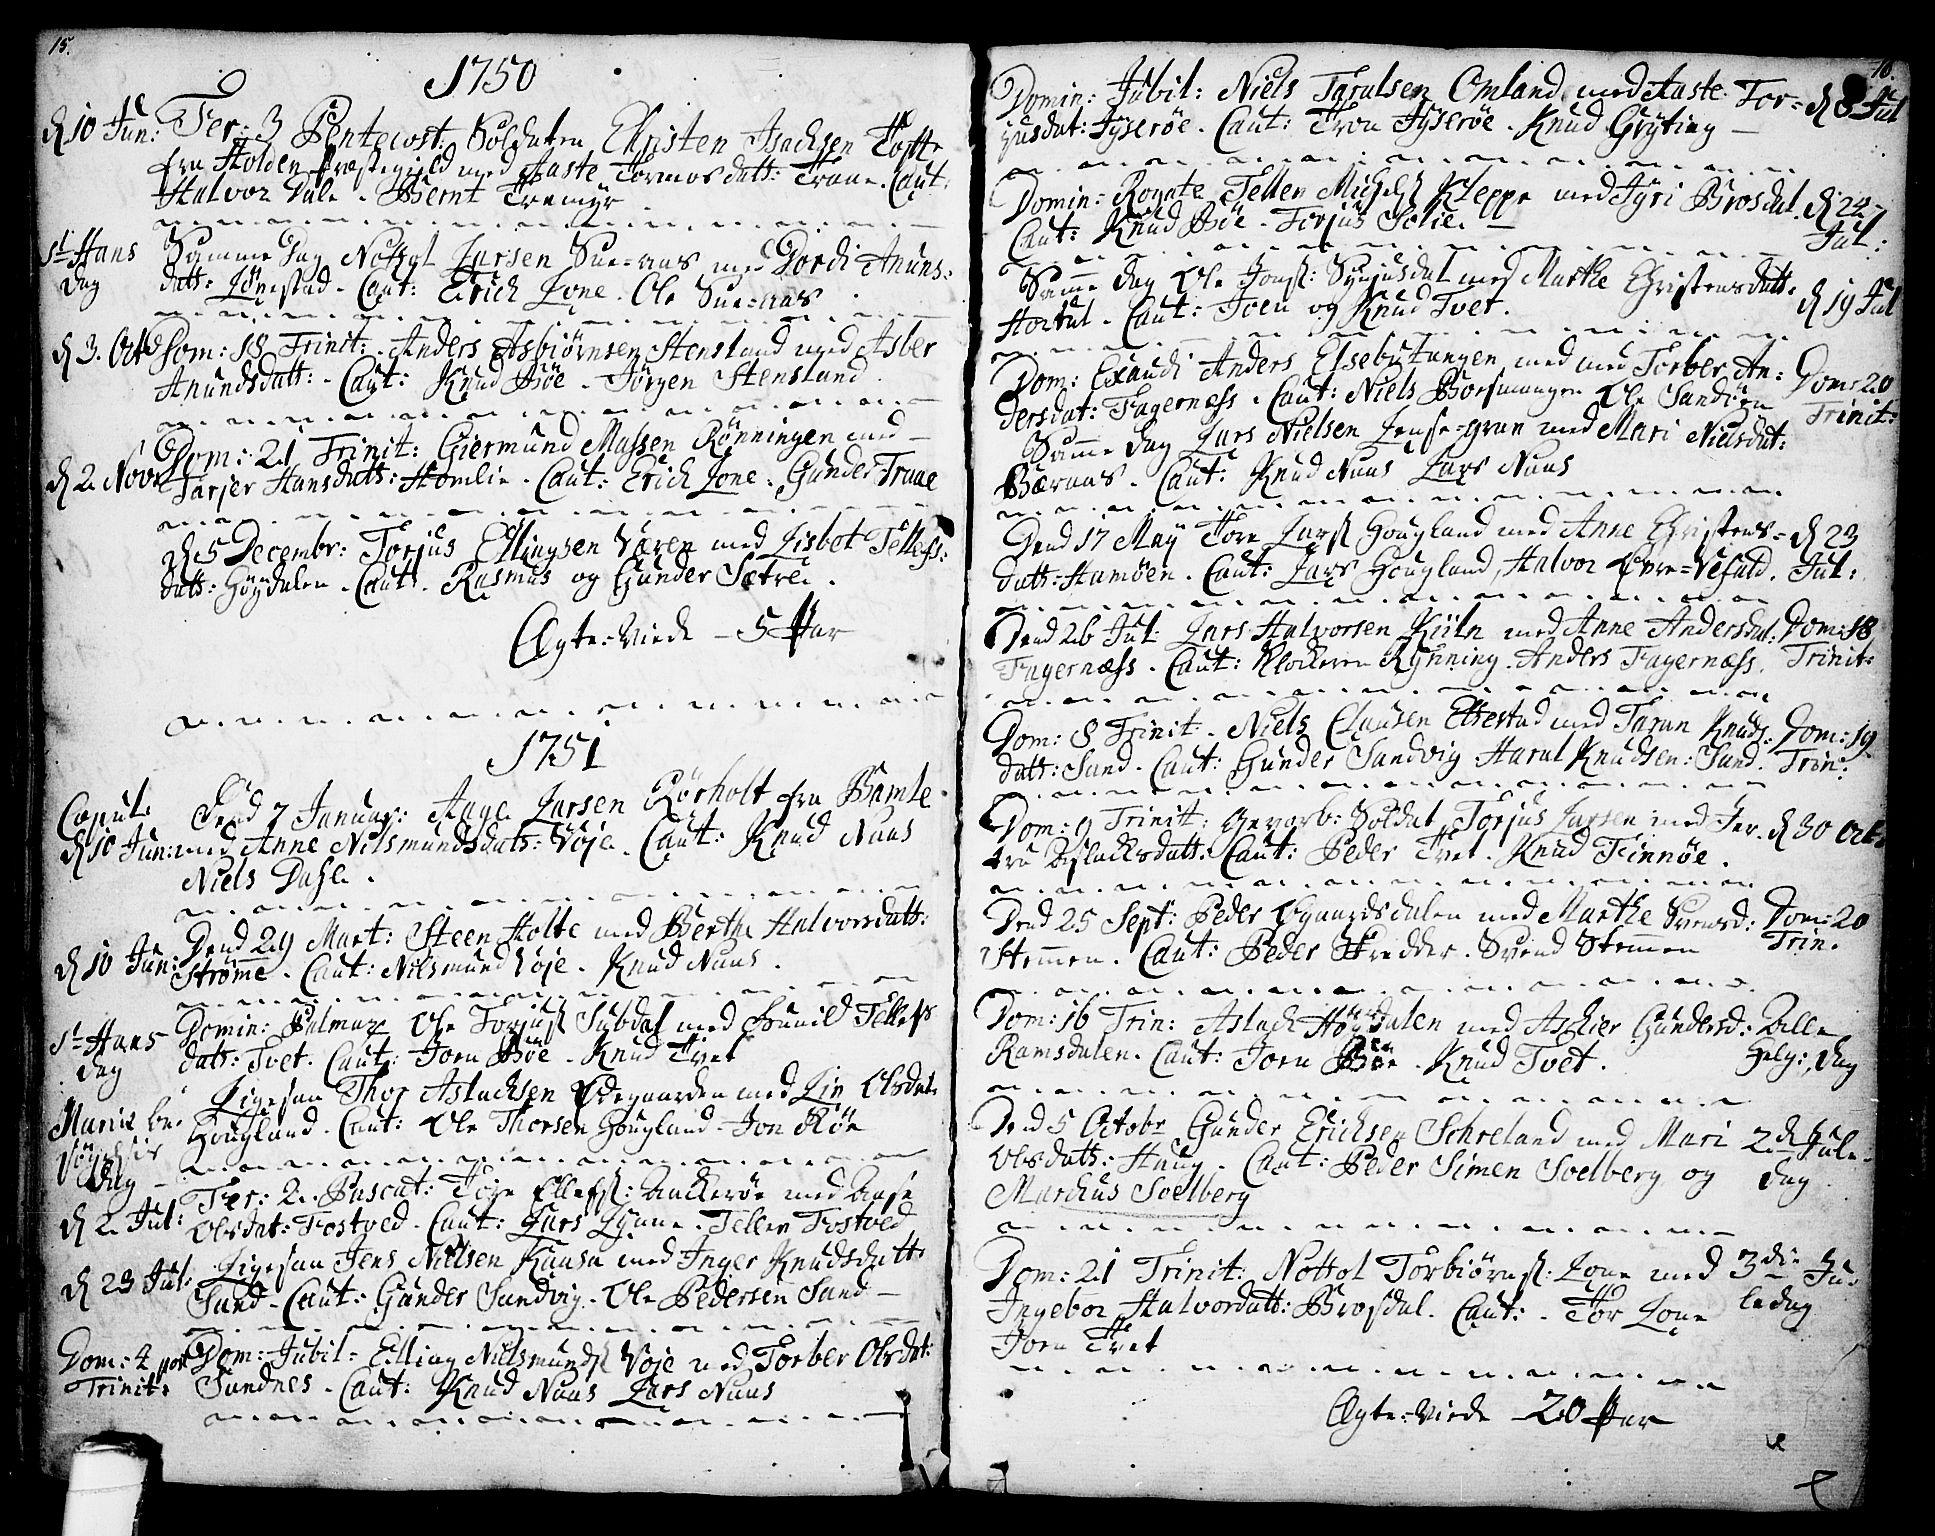 SAKO, Drangedal kirkebøker, F/Fa/L0001: Ministerialbok nr. 1, 1697-1767, s. 15-16